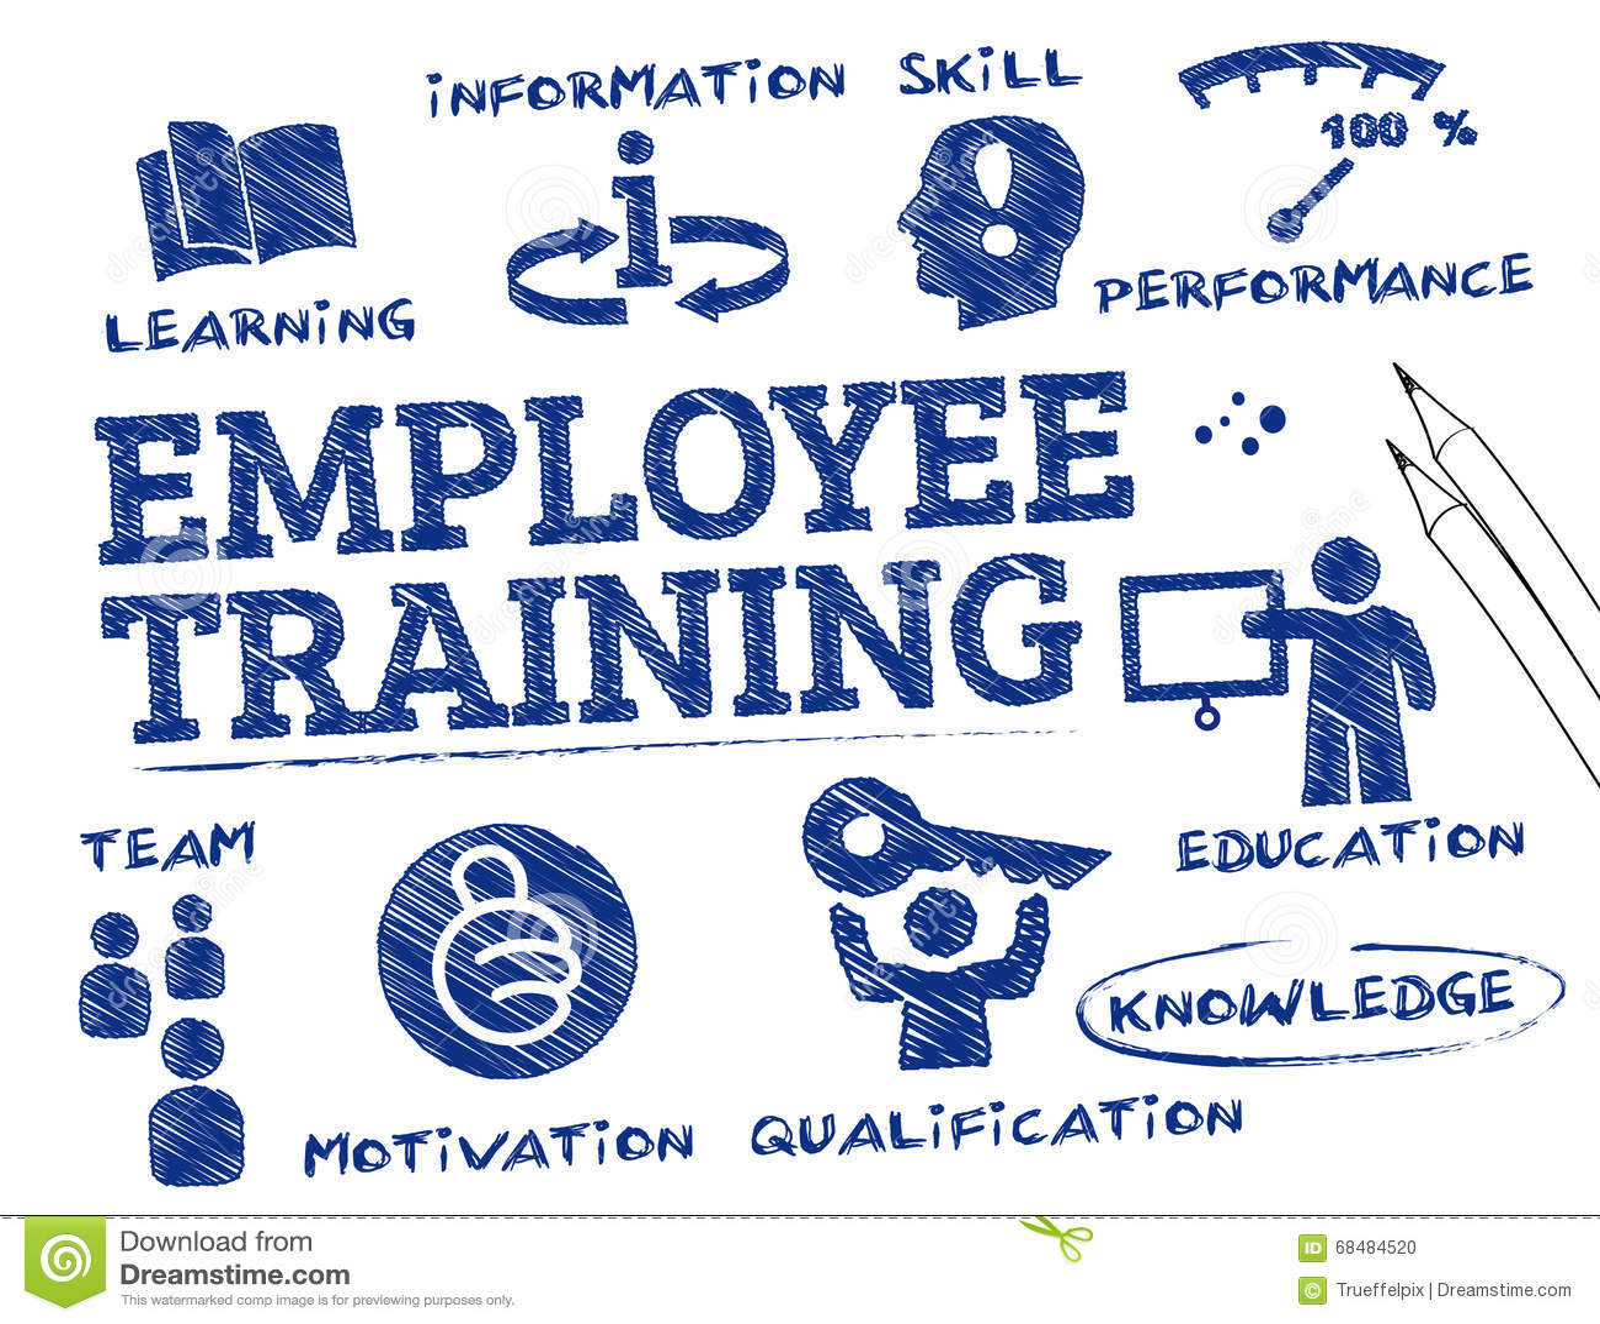 Employee Training Concept Stock Illustration - Image: 68484520